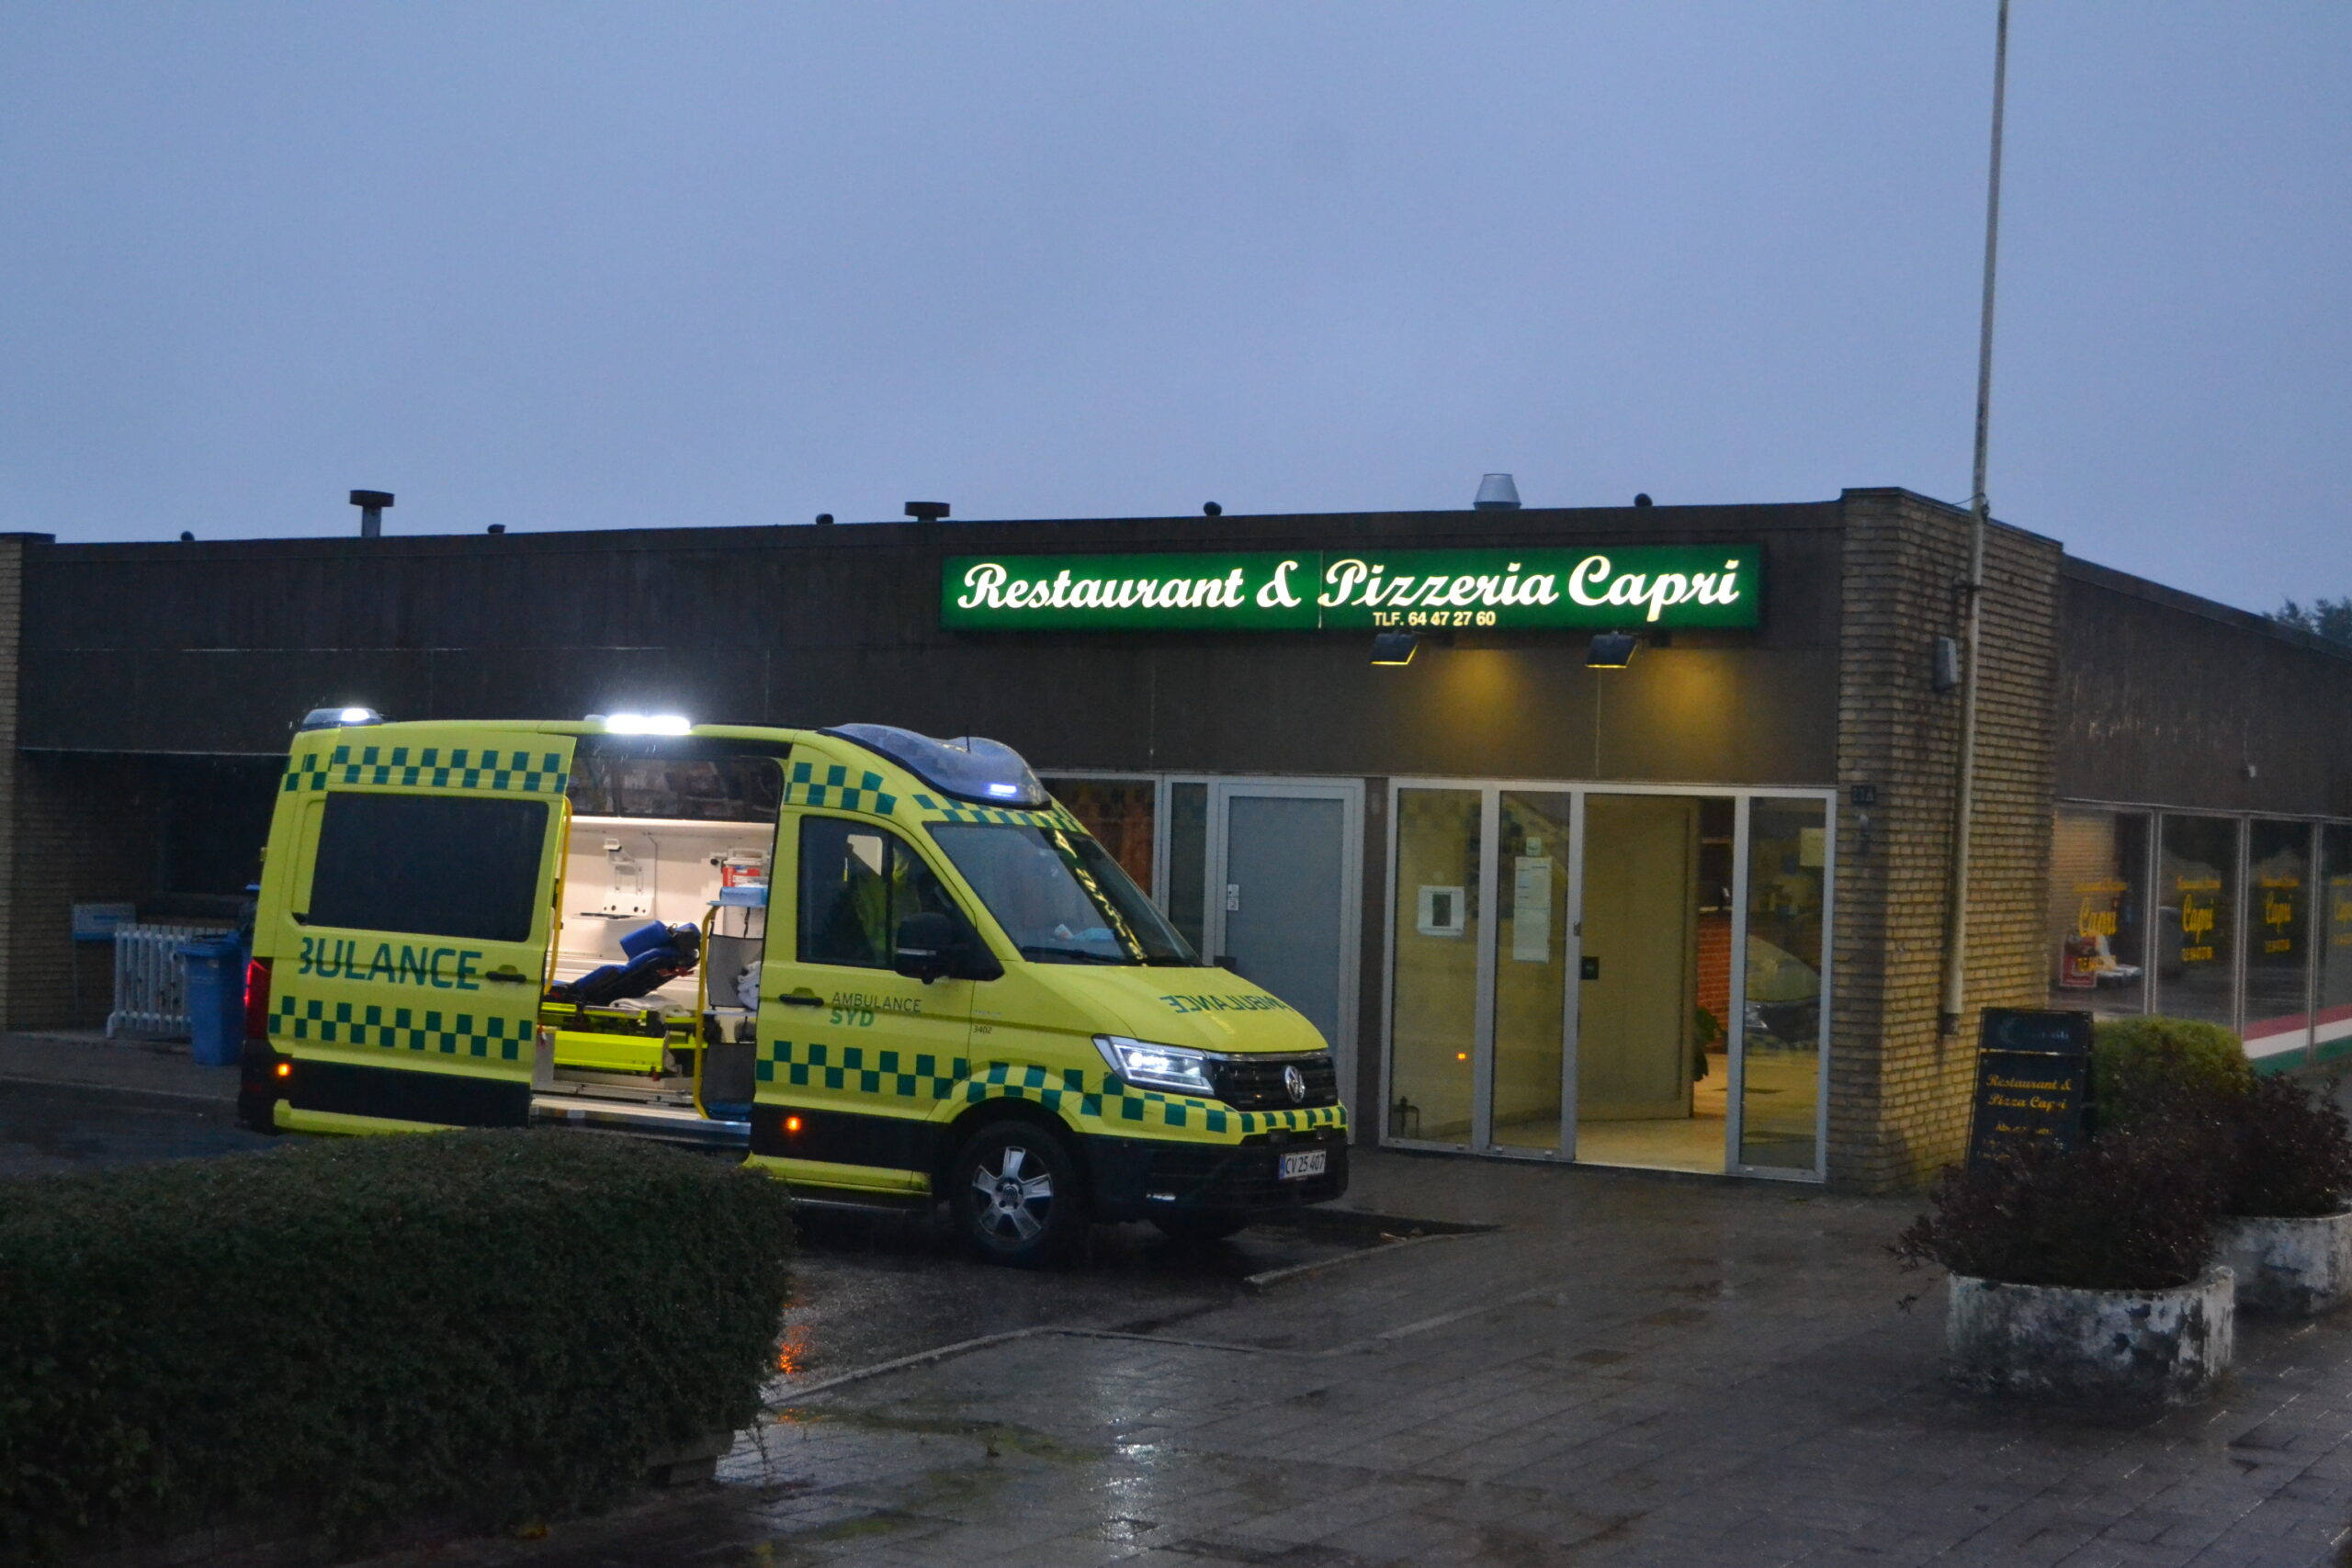 Person kollapset i pizzaria - ambulance er fremme